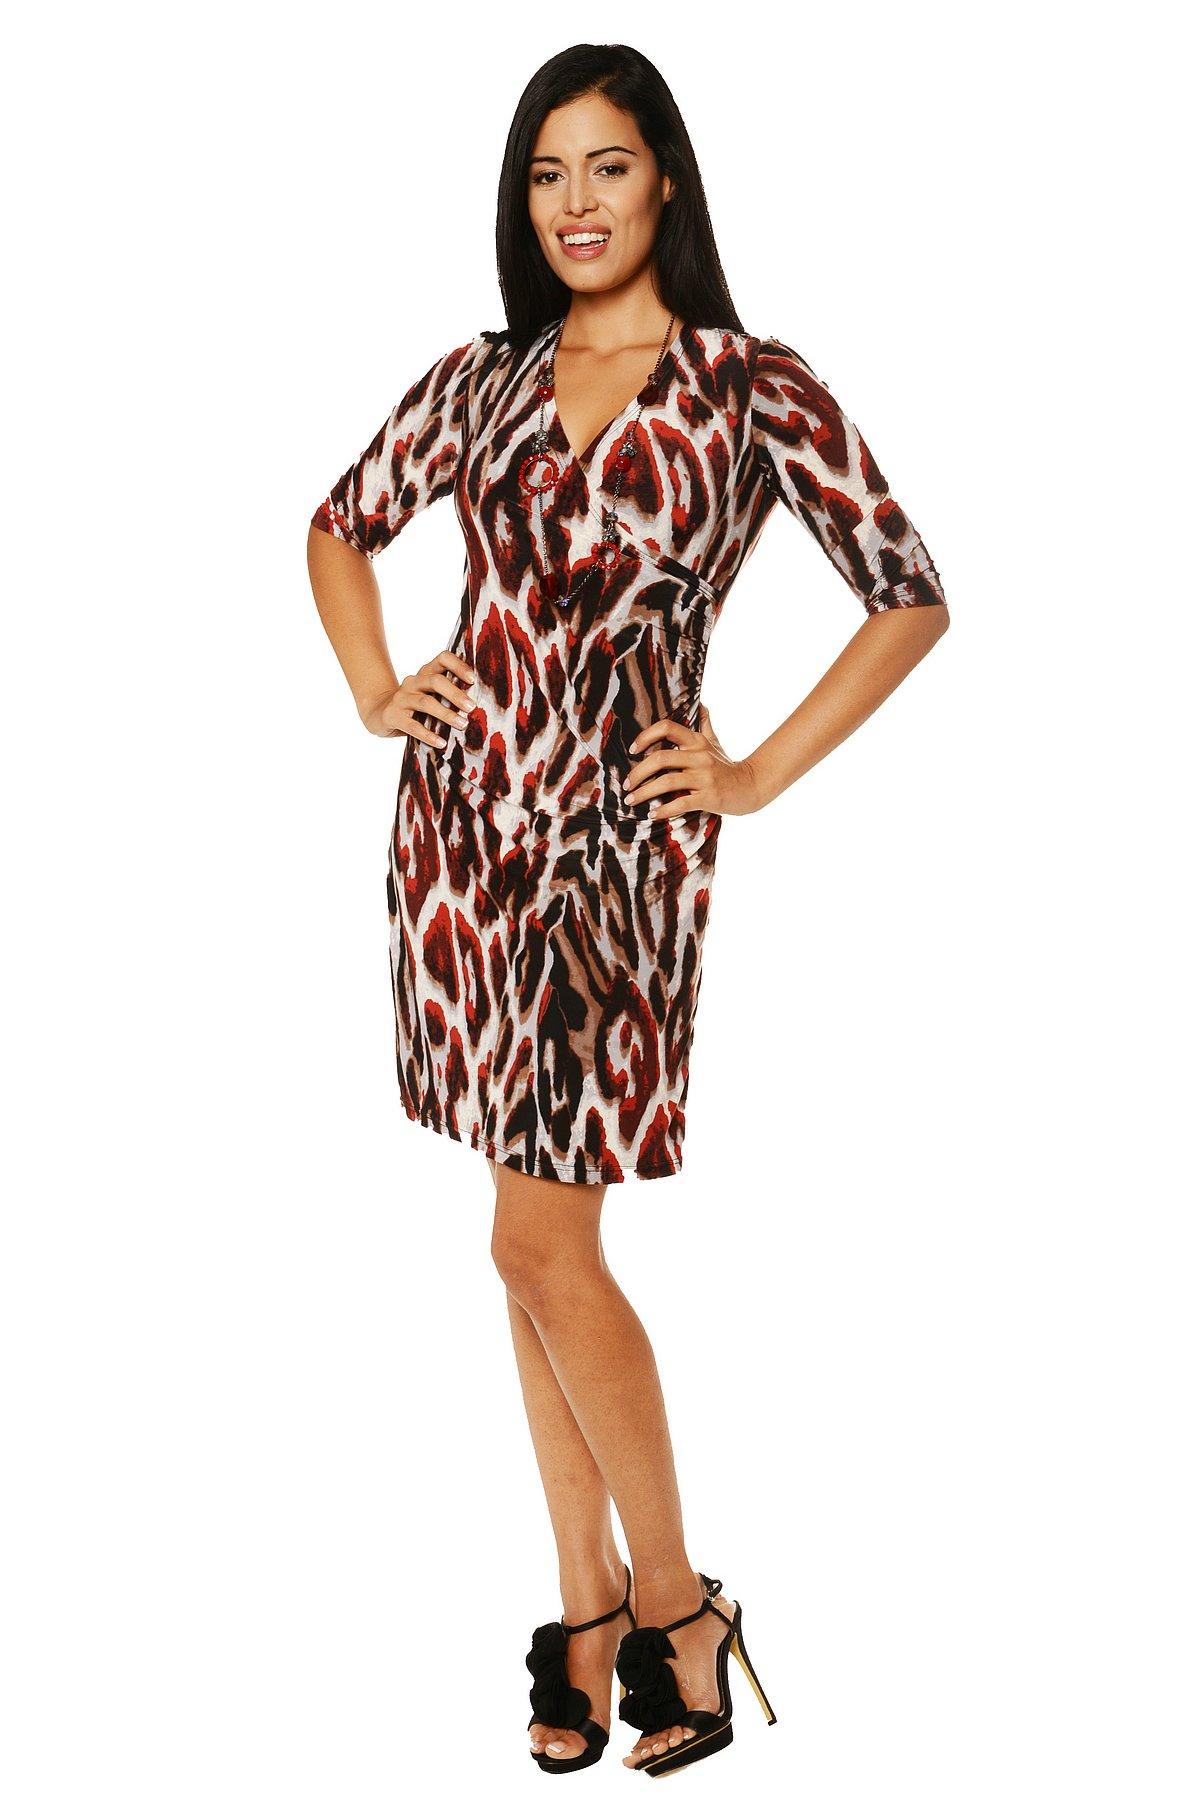 24/7 Comfort Apparel Women's Printed Faux Wrap Dress at Sears.com